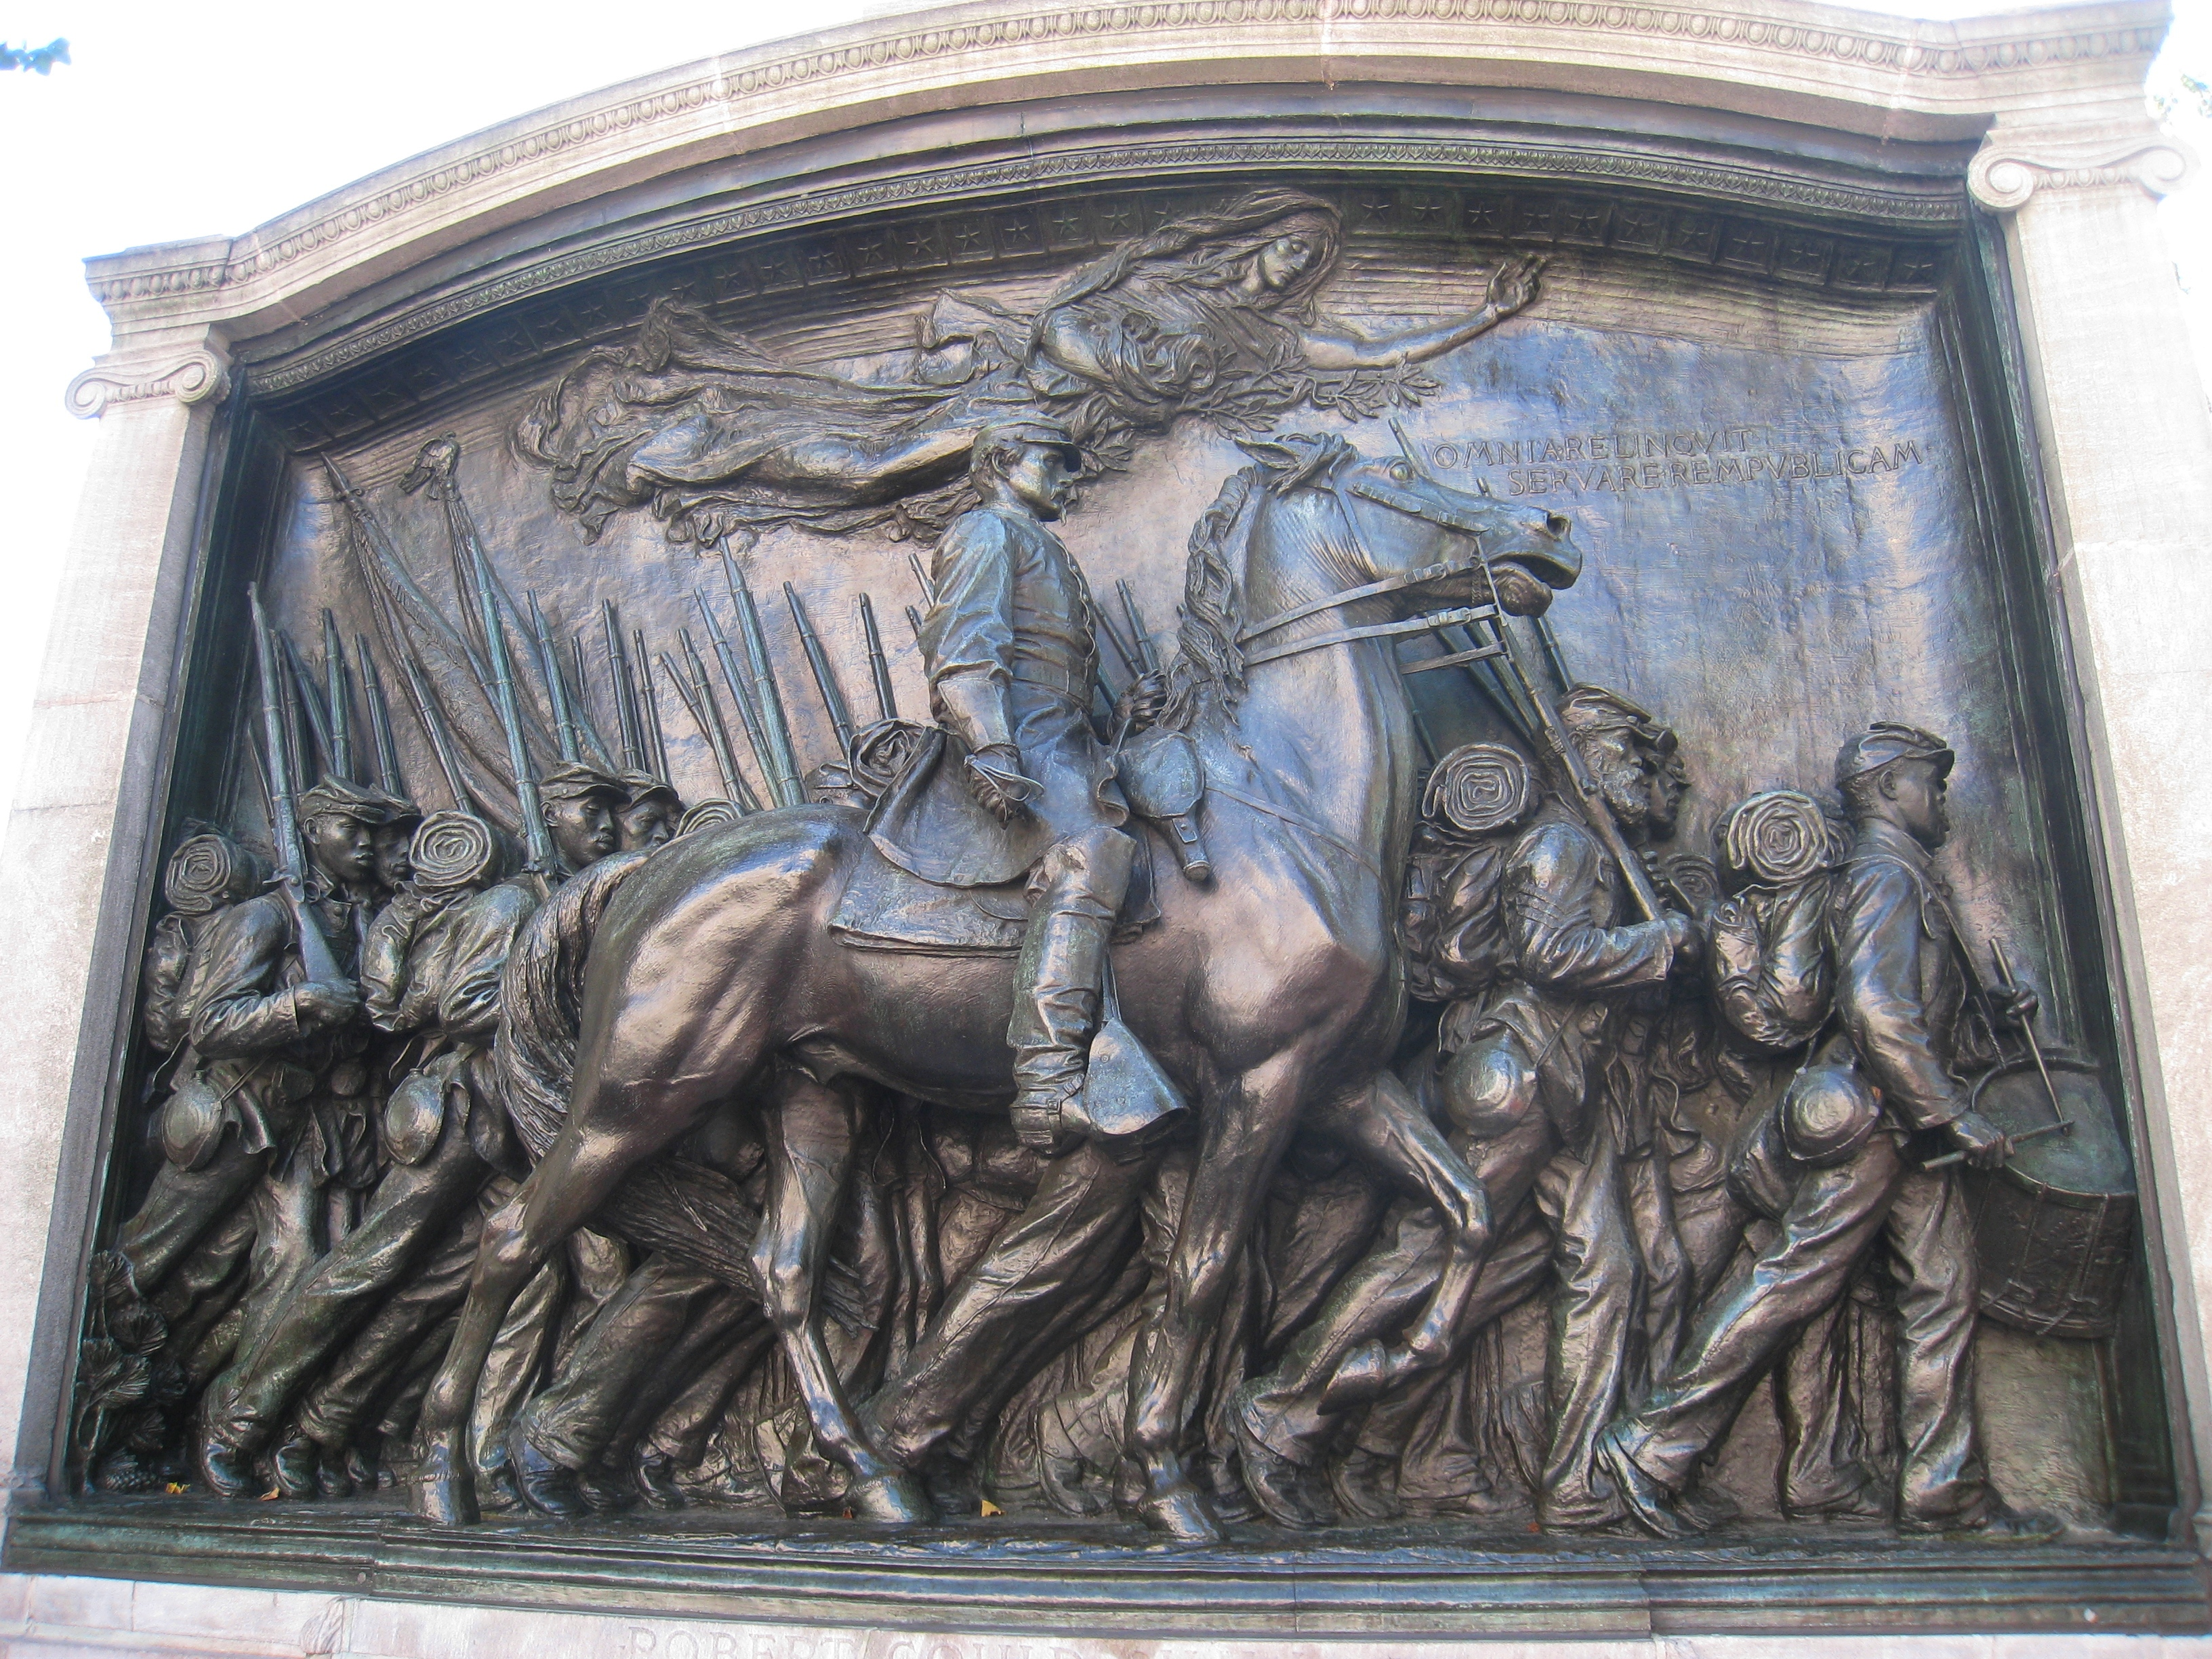 external image Memorial_to_Robert_Gould_Shaw_and_the_54th_Massachusetts_Volunteer_Infantry_Regiment%2C_Boston.JPG